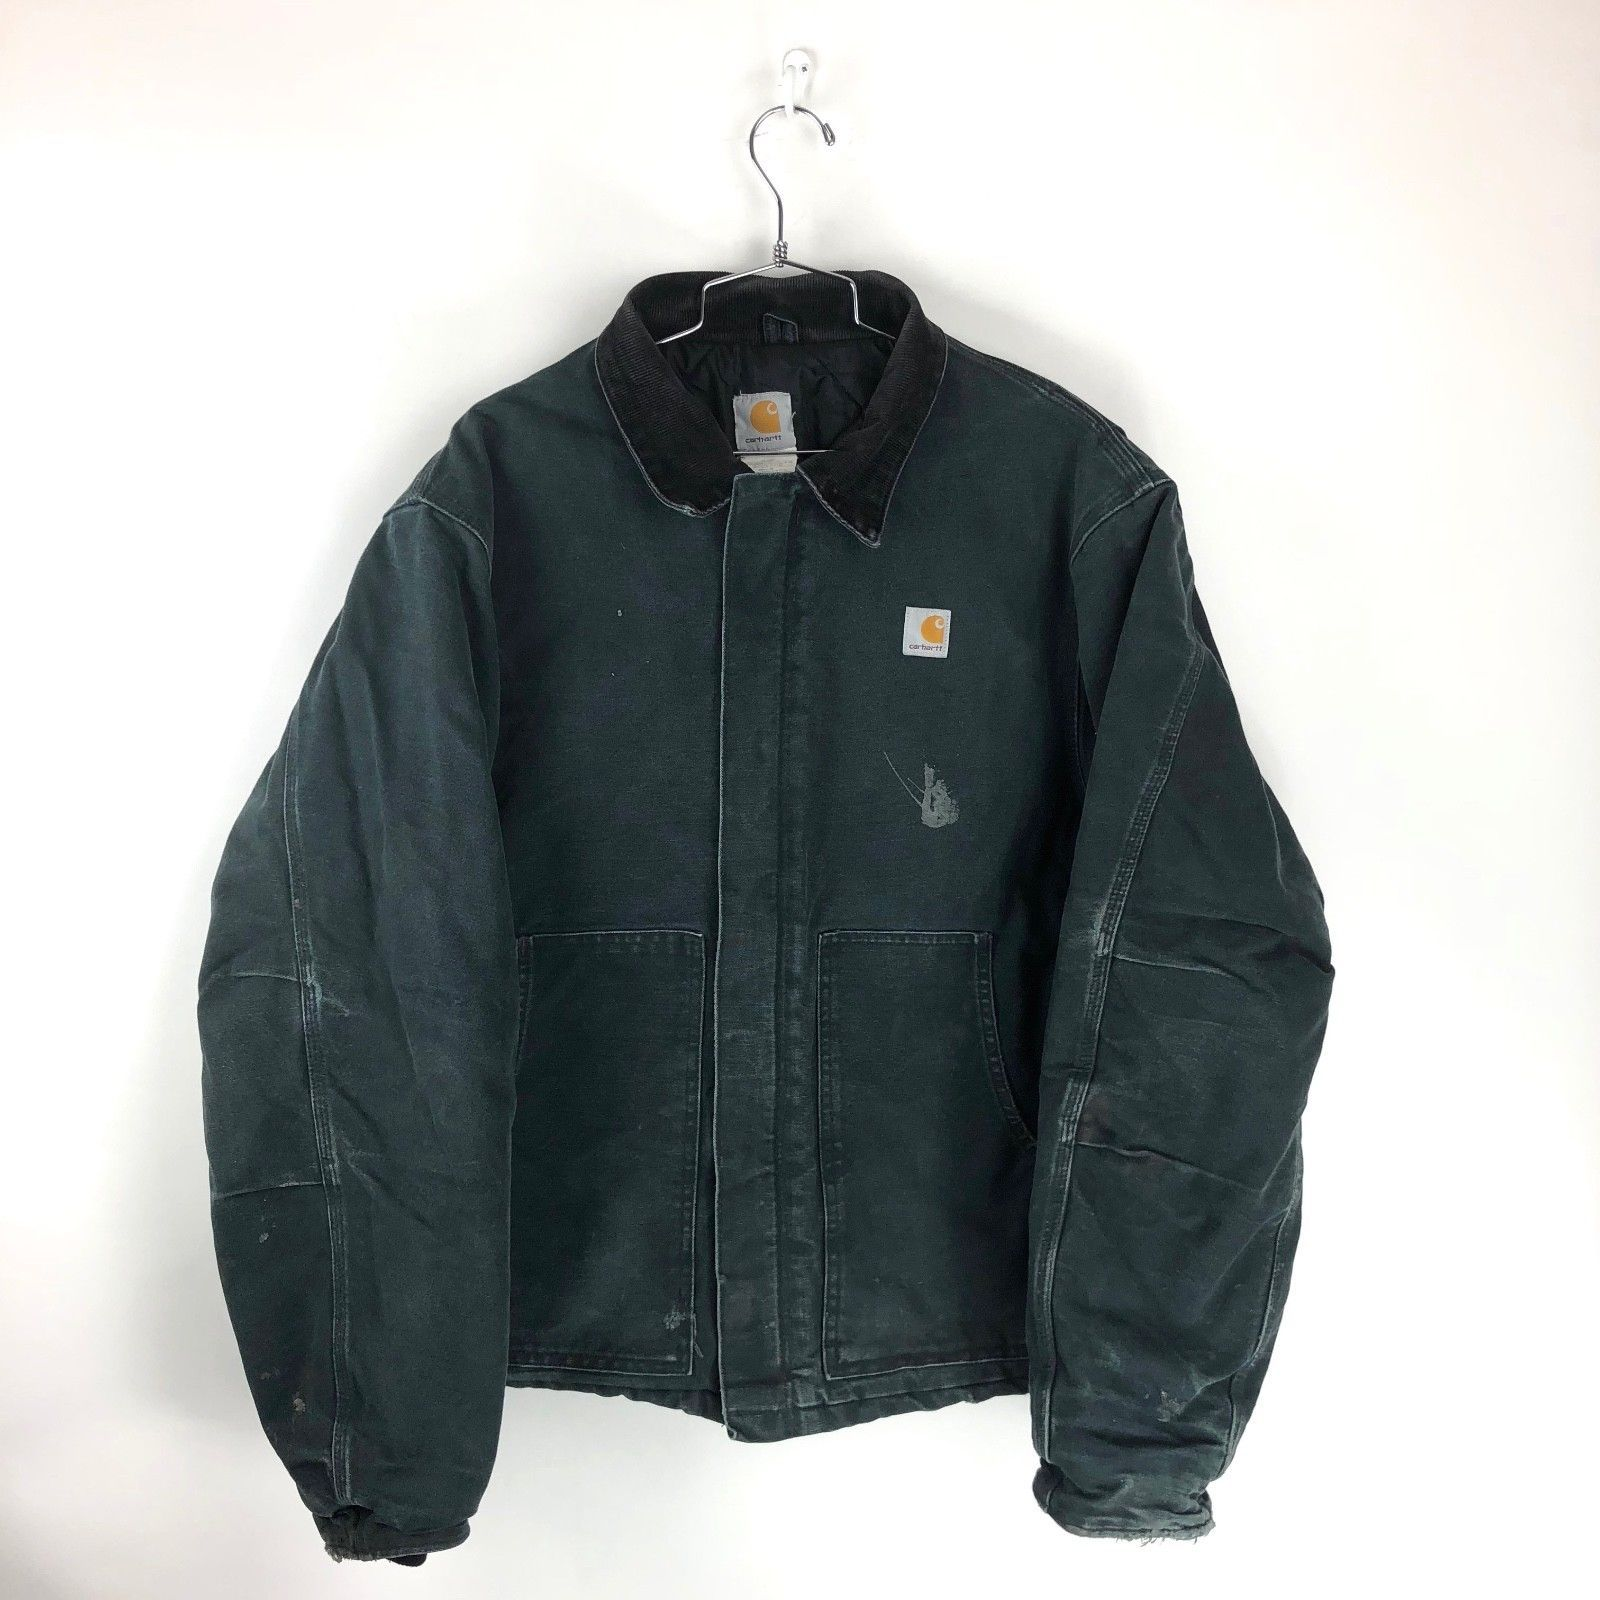 Vintage Carhartt Black Insulated Lined Jacket Mens Xl Usa Made Coat Zip Work Workwear Vintage Carhartt Jacket Workwear Menswear [ 1600 x 1600 Pixel ]